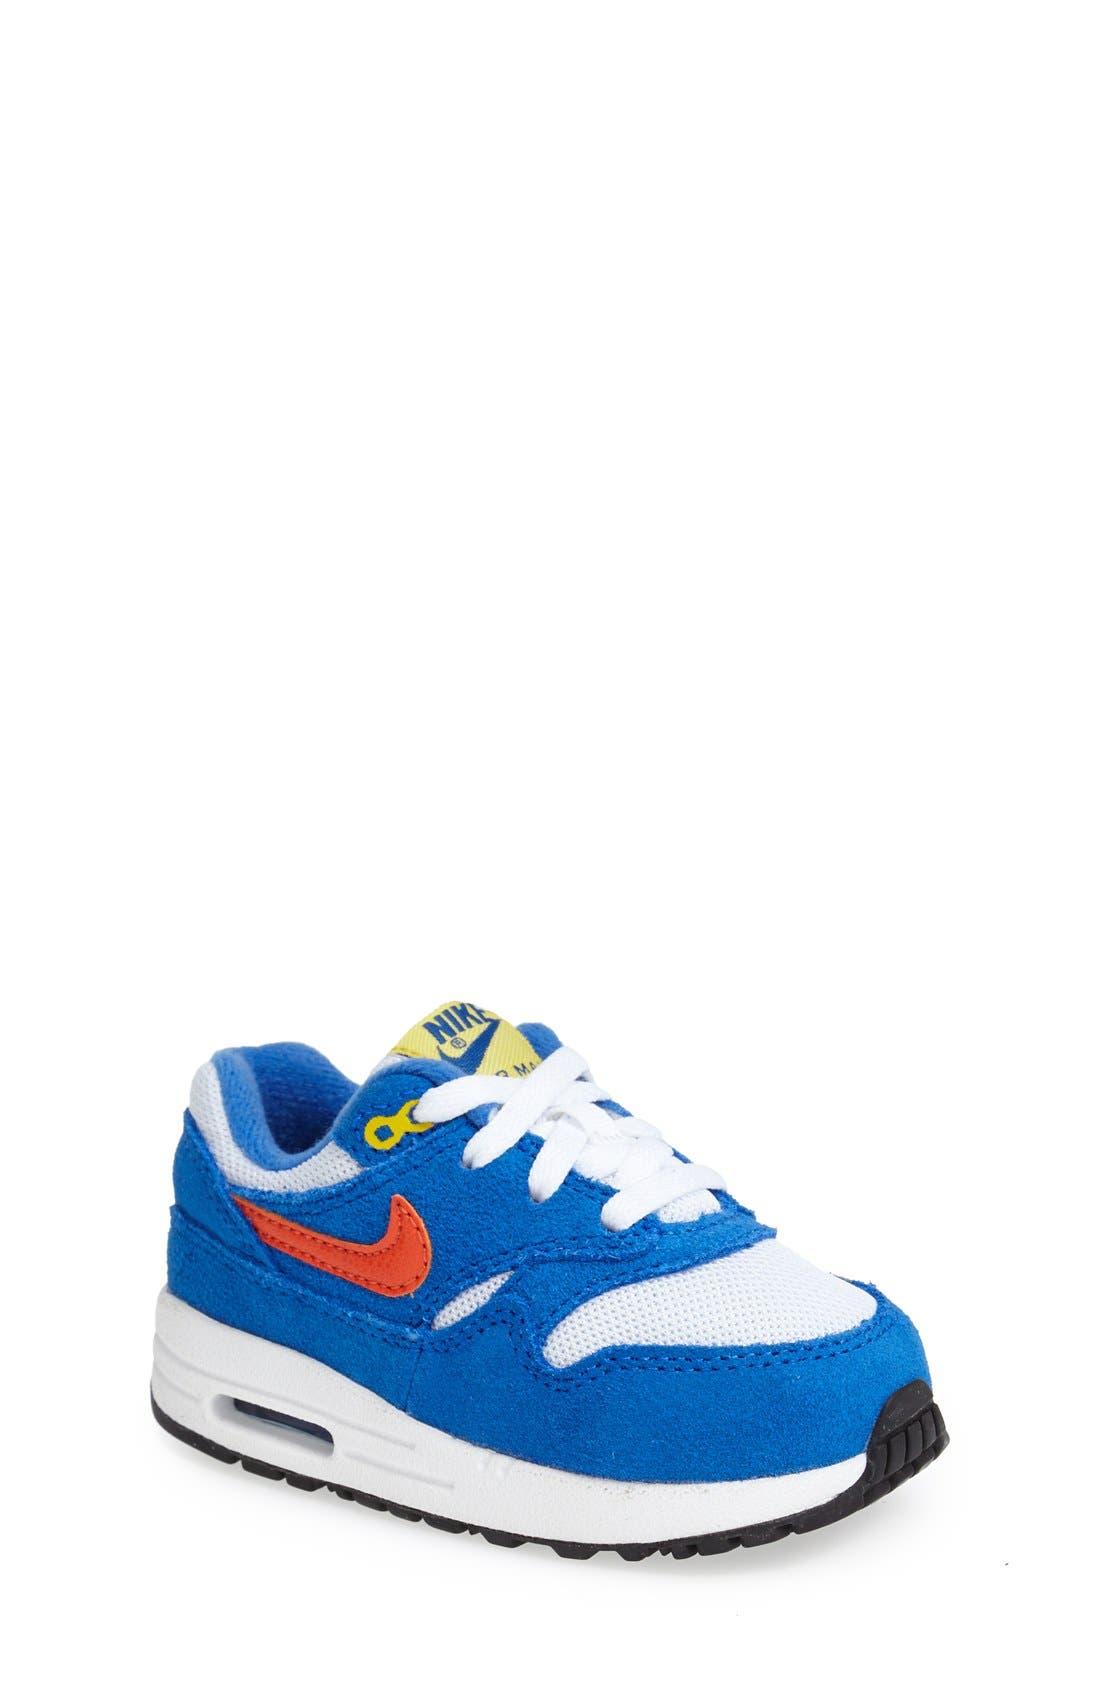 Alternate Image 1 Selected - Nike 'Air Max 1 TD' Sneaker (Baby, Walker & Toddler)